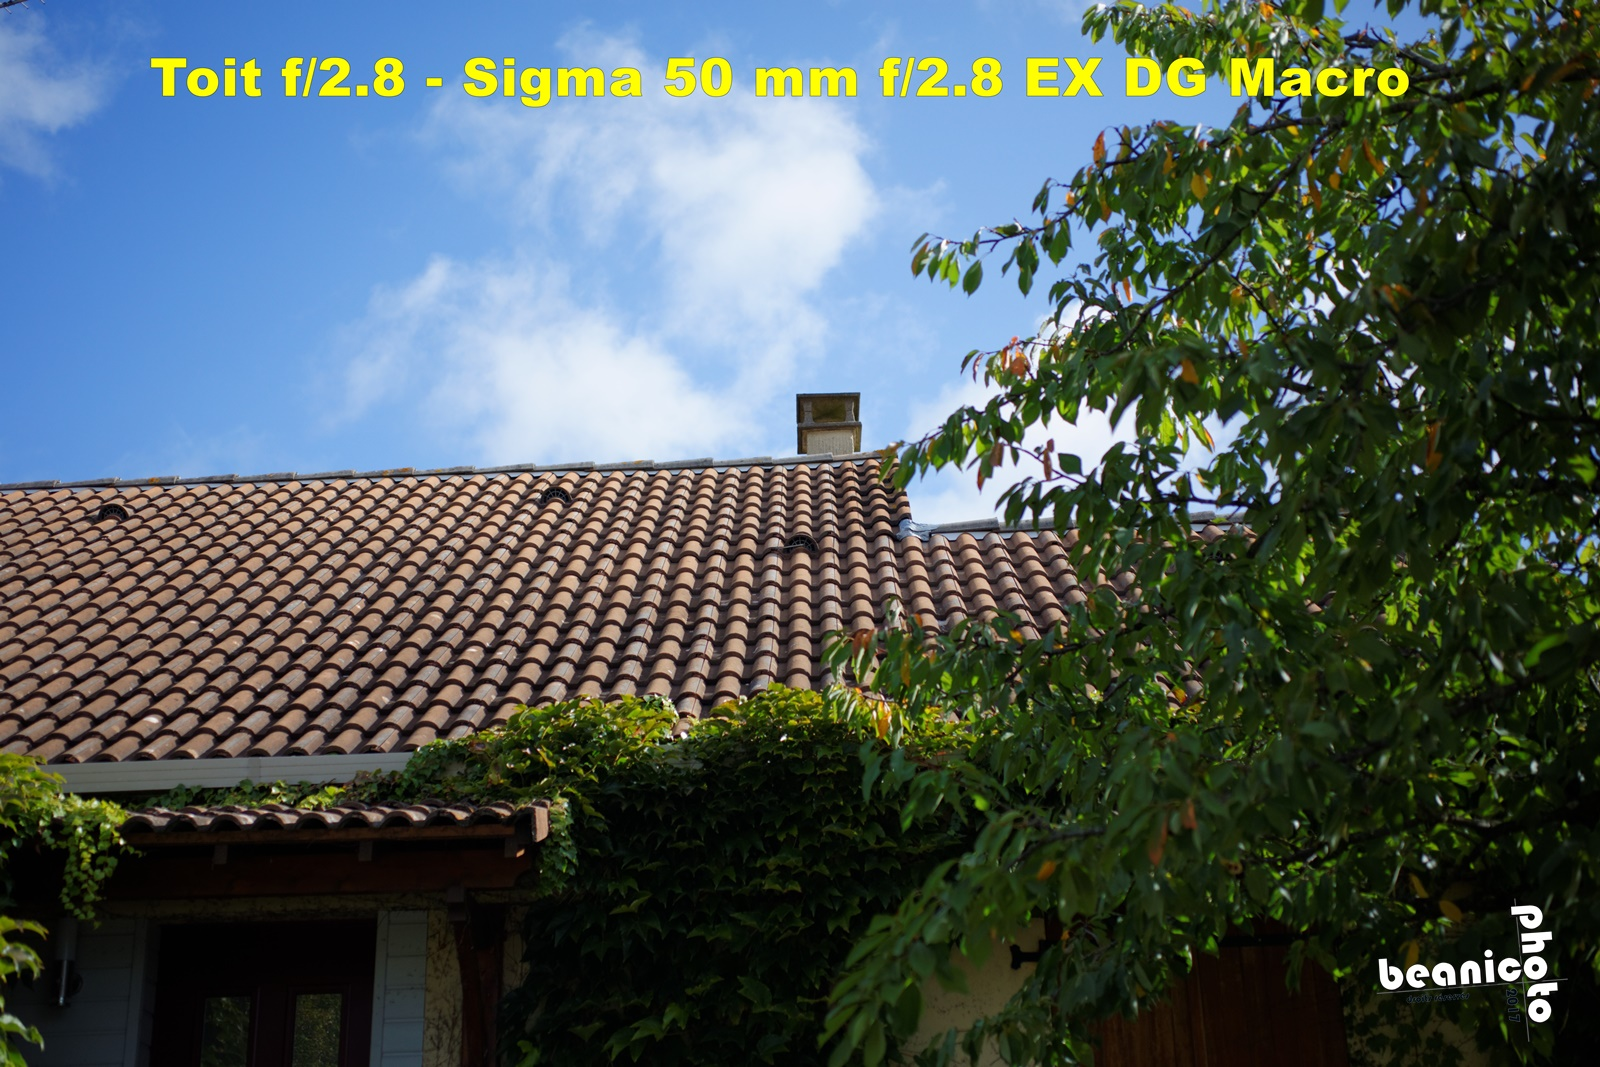 Canon 5DIII + Sigma 50 mm f/2.8 EX DG Macro - f/2.8 1/6000 ISO400 - beanico-photo